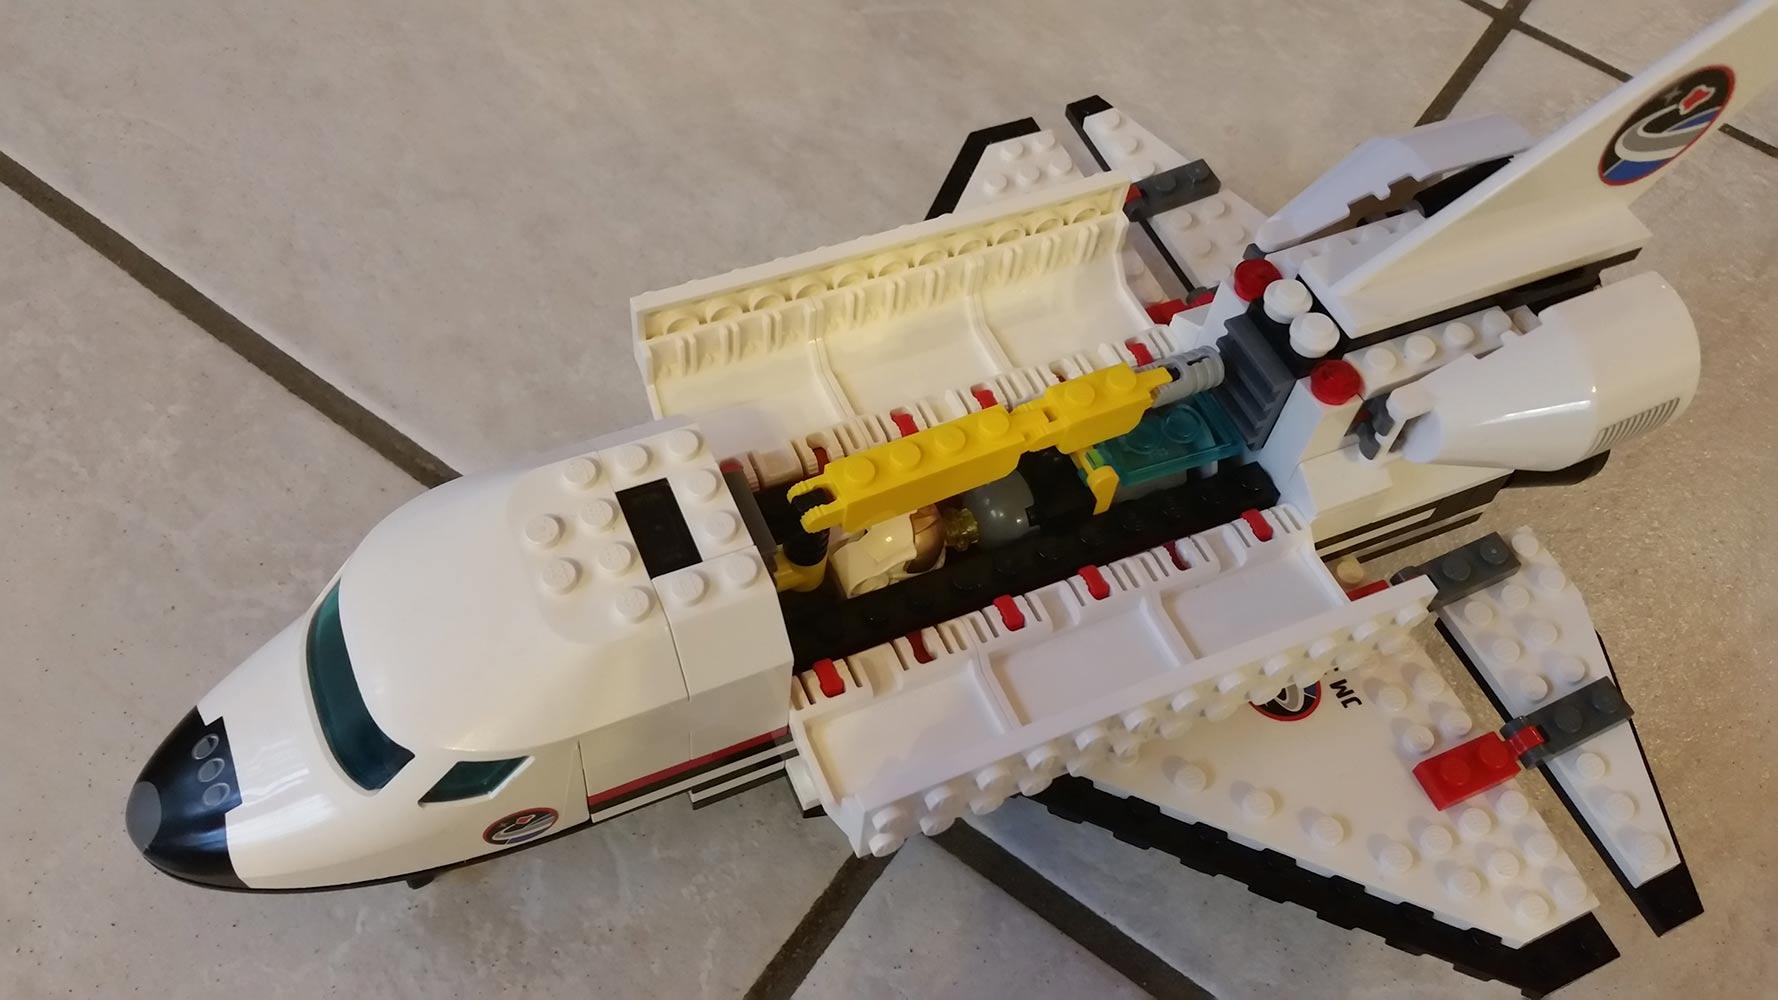 lego space shuttle alt bauanleitung - photo #43